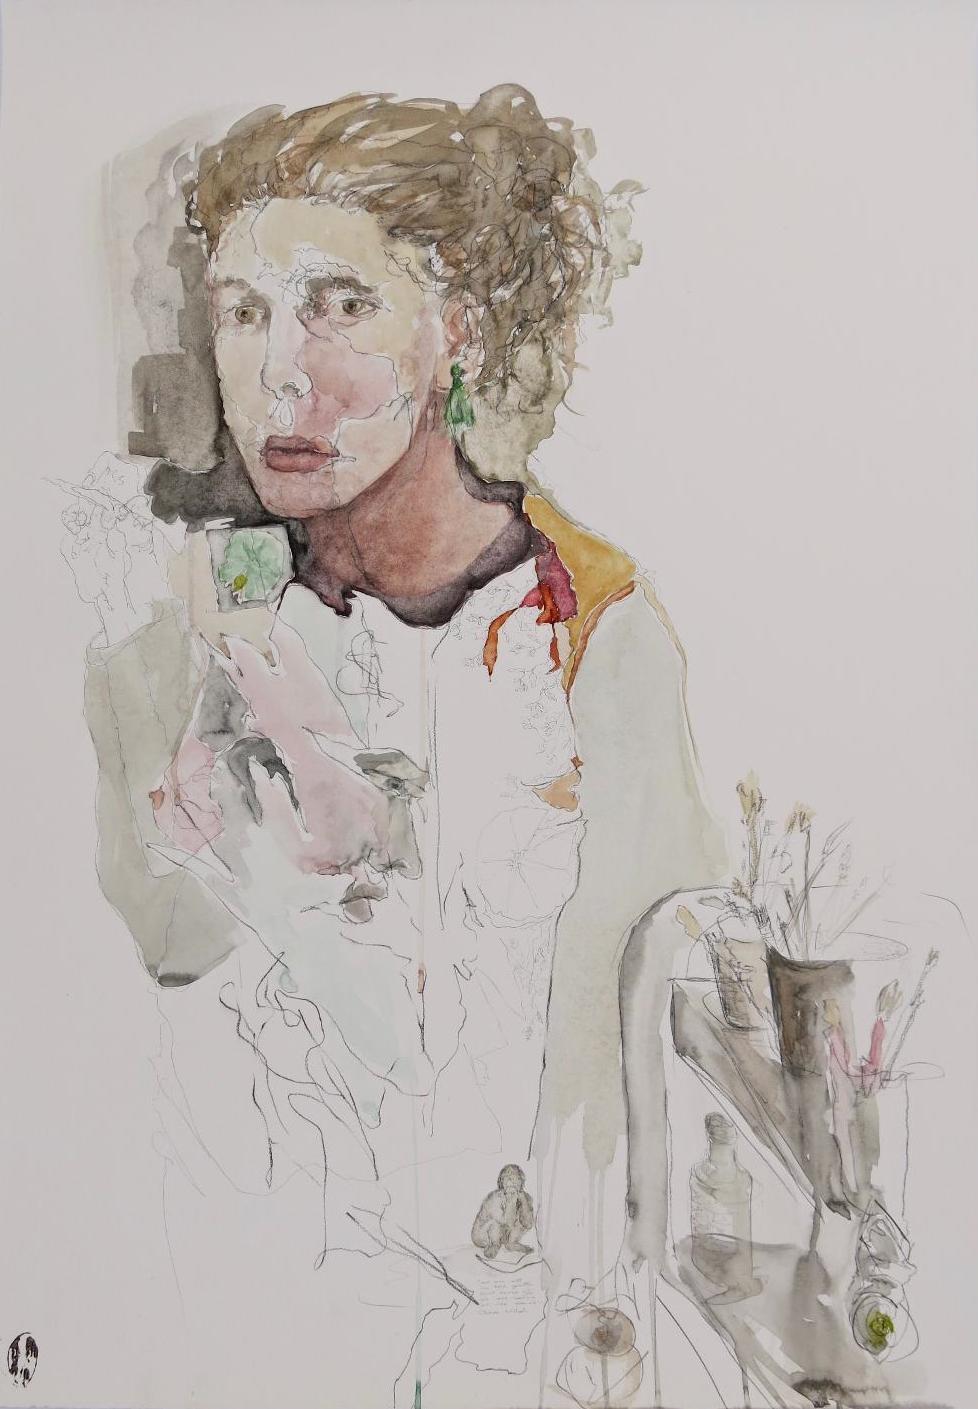 Daughter - she reminds me (Shany Van Den Berg).jpg